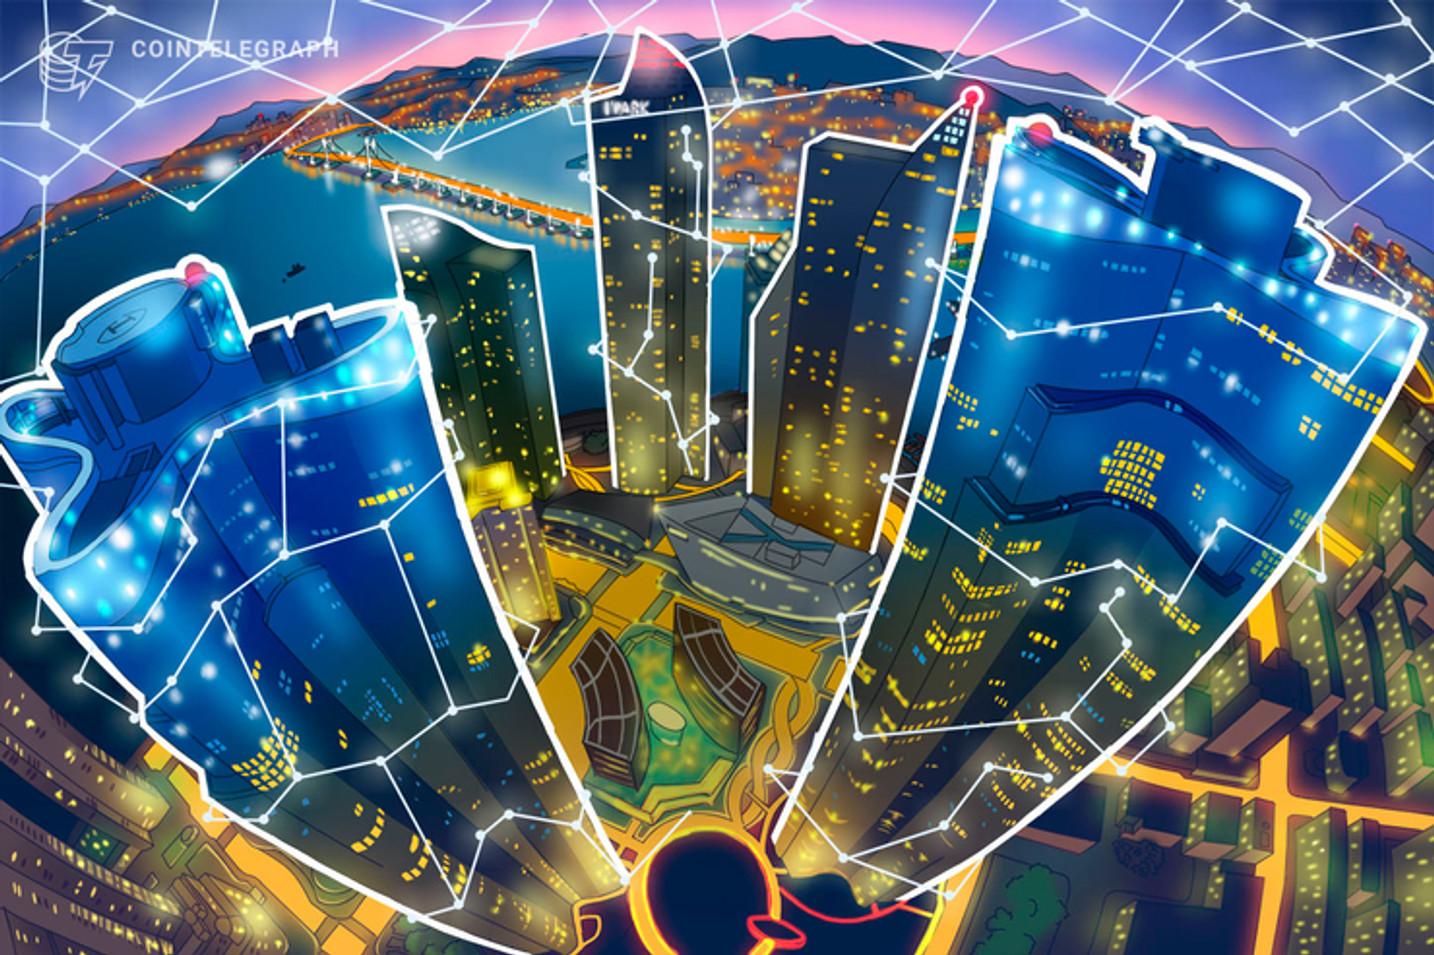 Escola Saint Paul e IBM anunciam programas educacionais de TI que abrangem blockchain